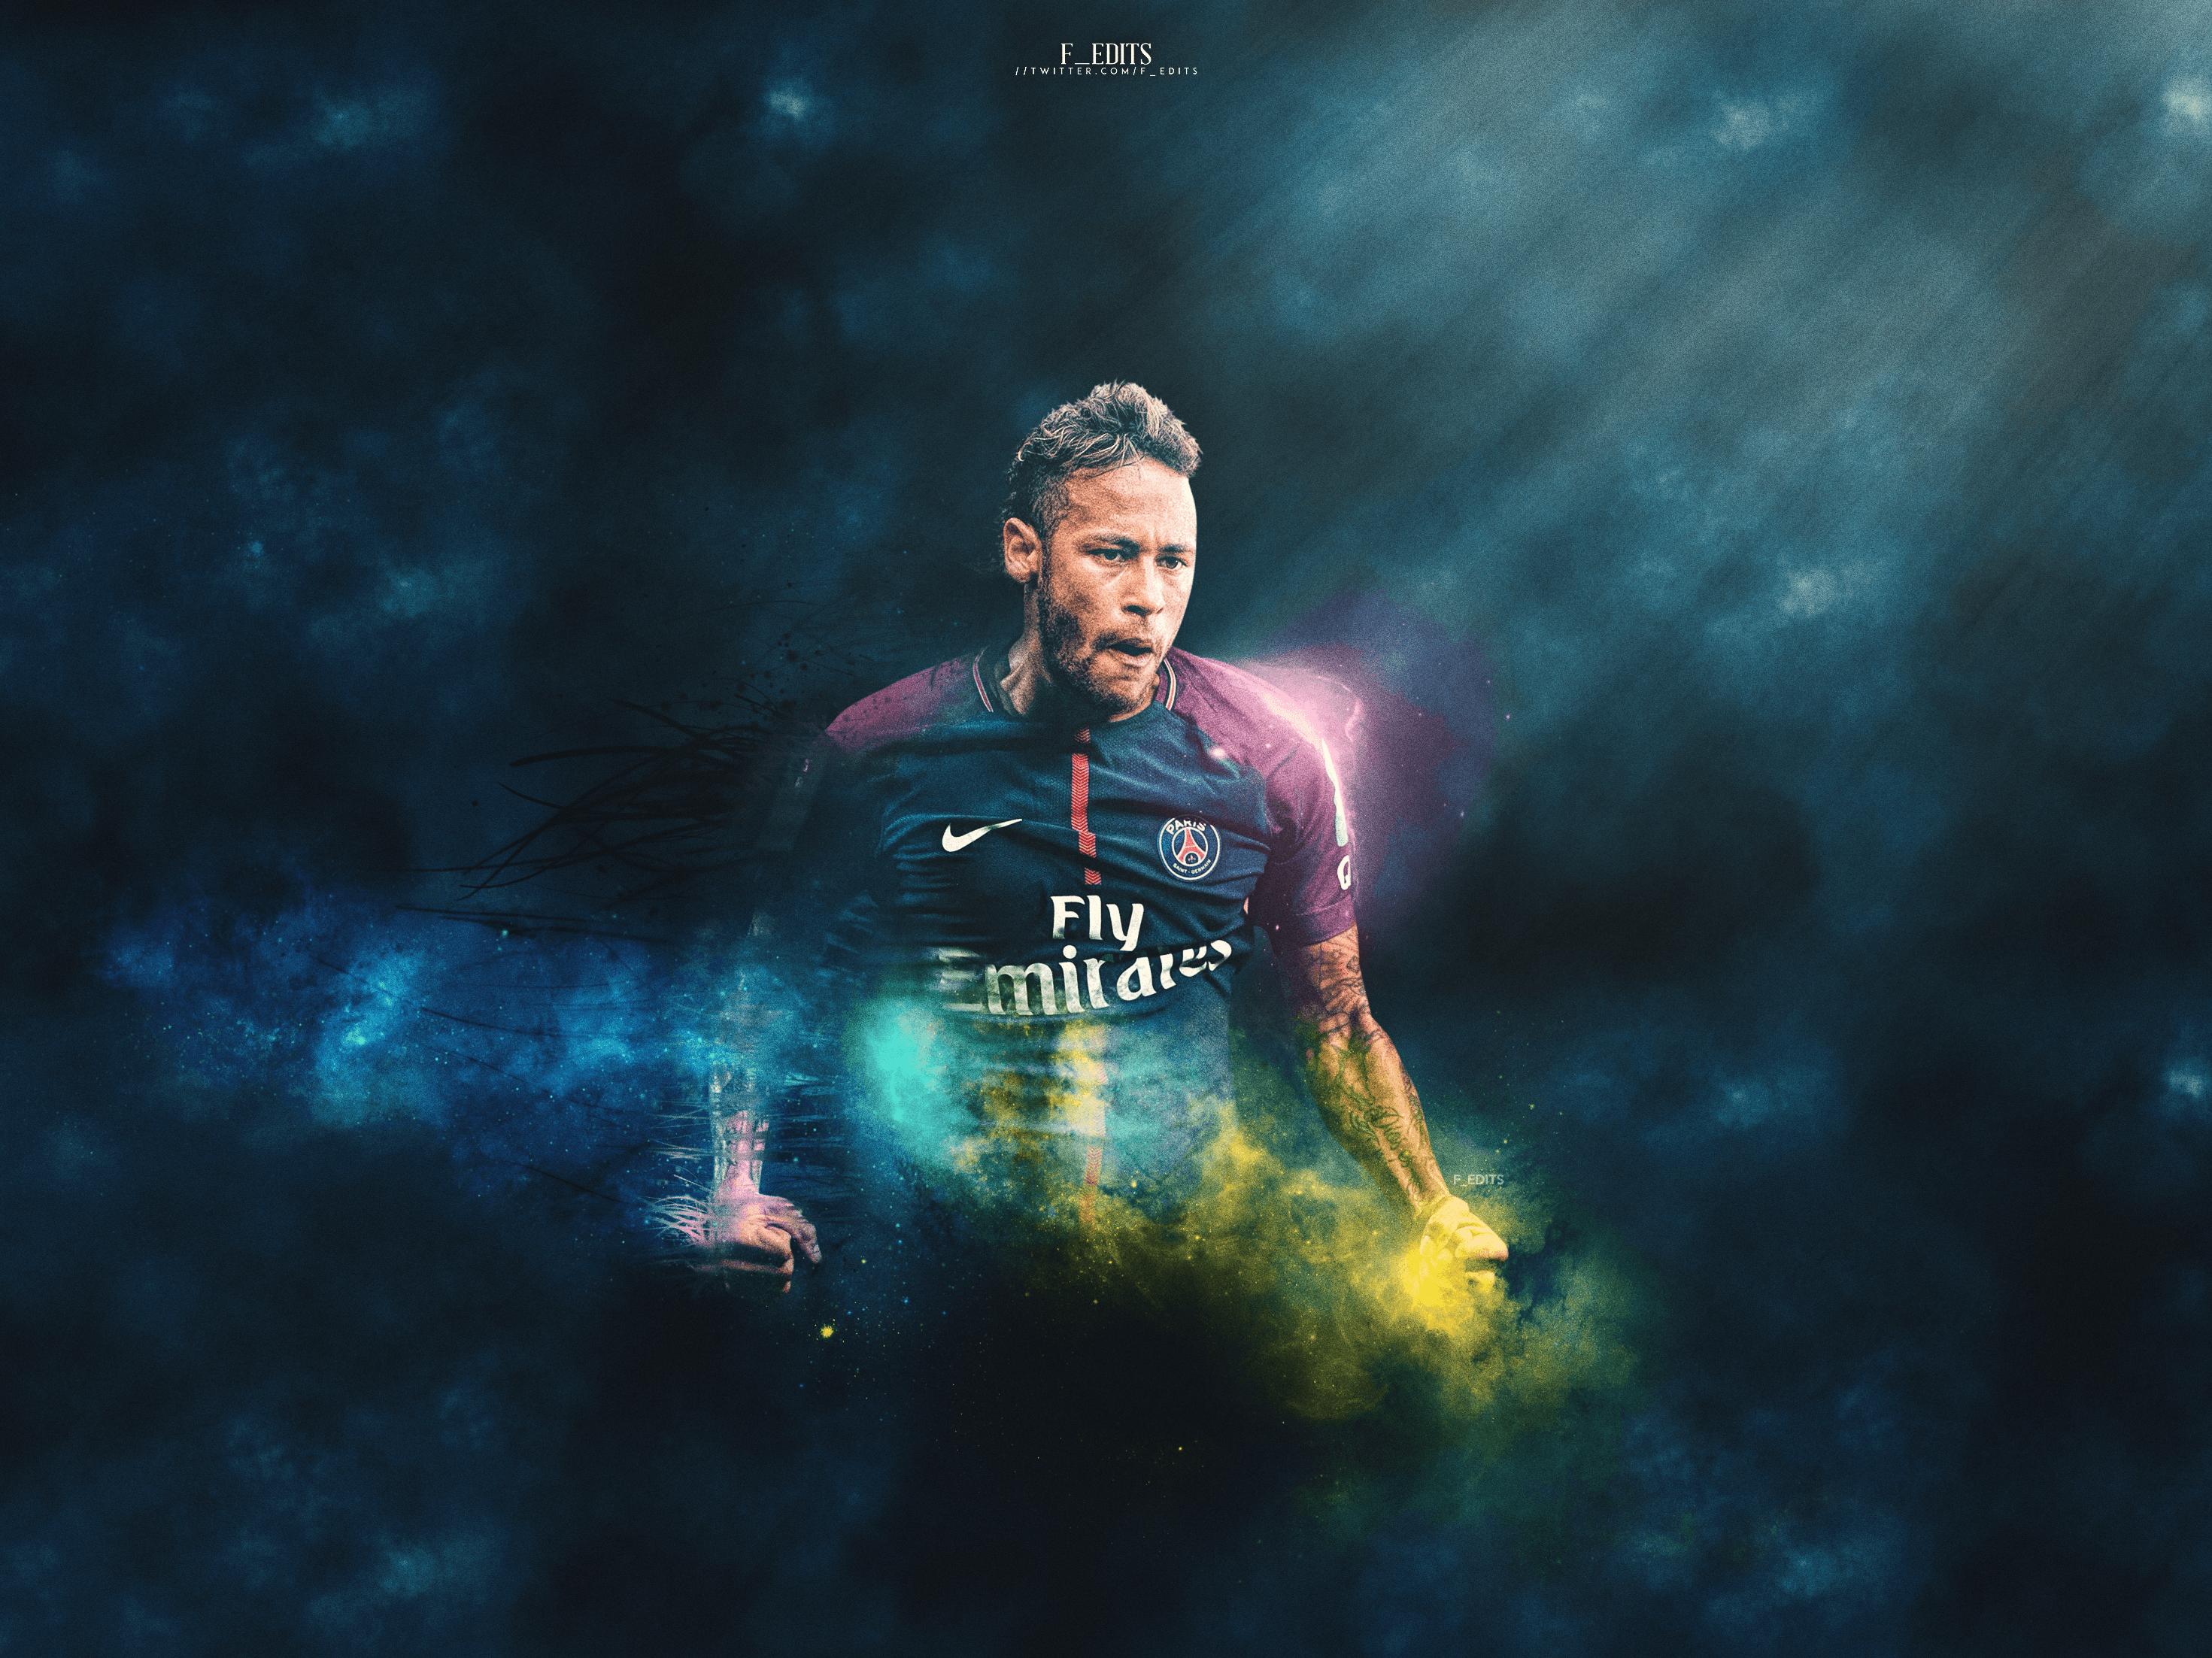 Neymar PSG Wallpapers 2941x2205